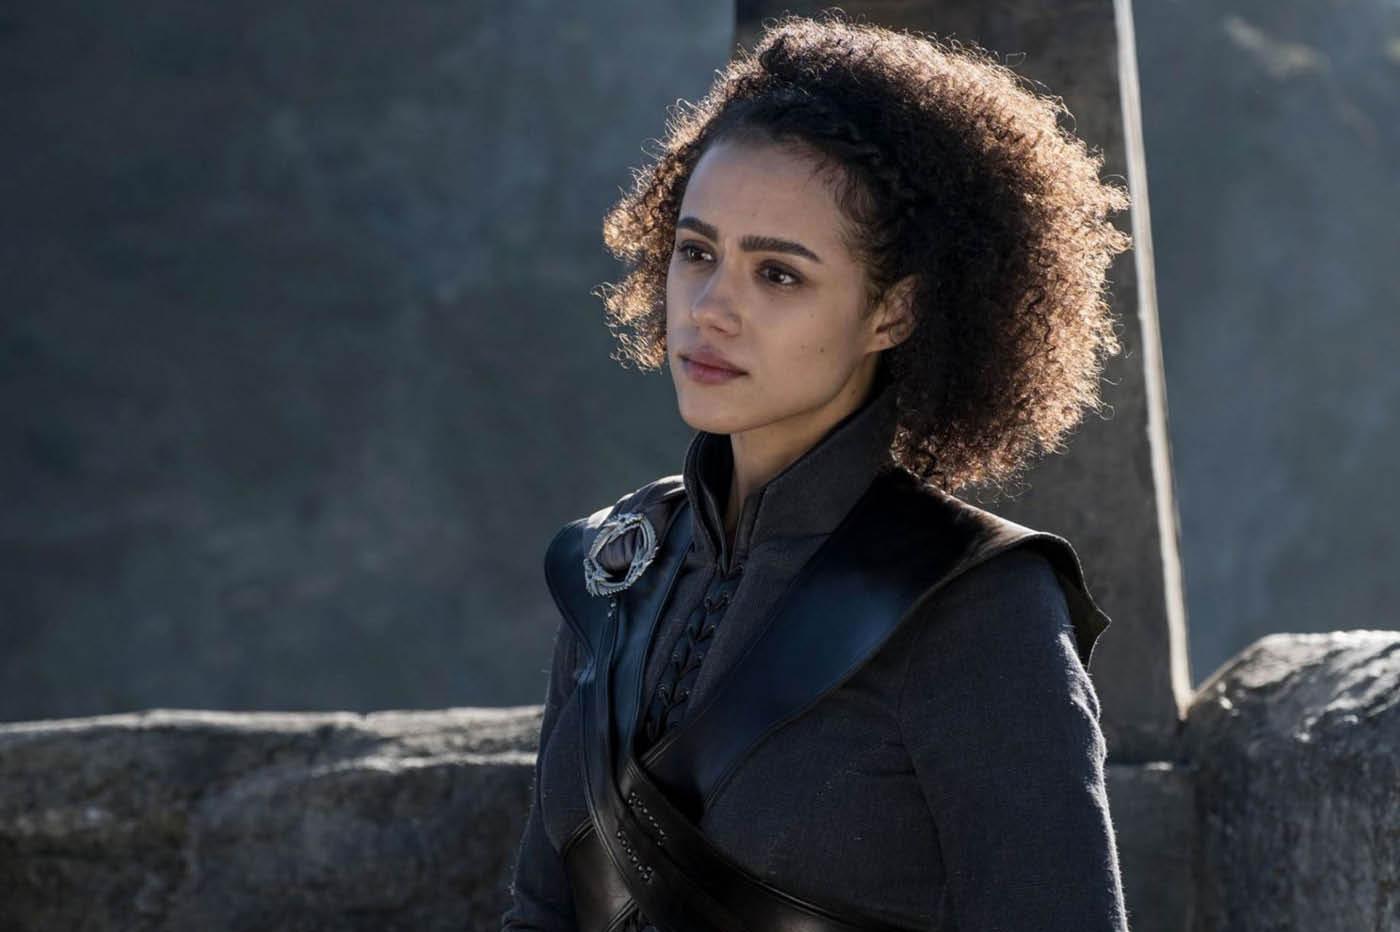 Natalie Emmanuel dans la série Game of Thrones